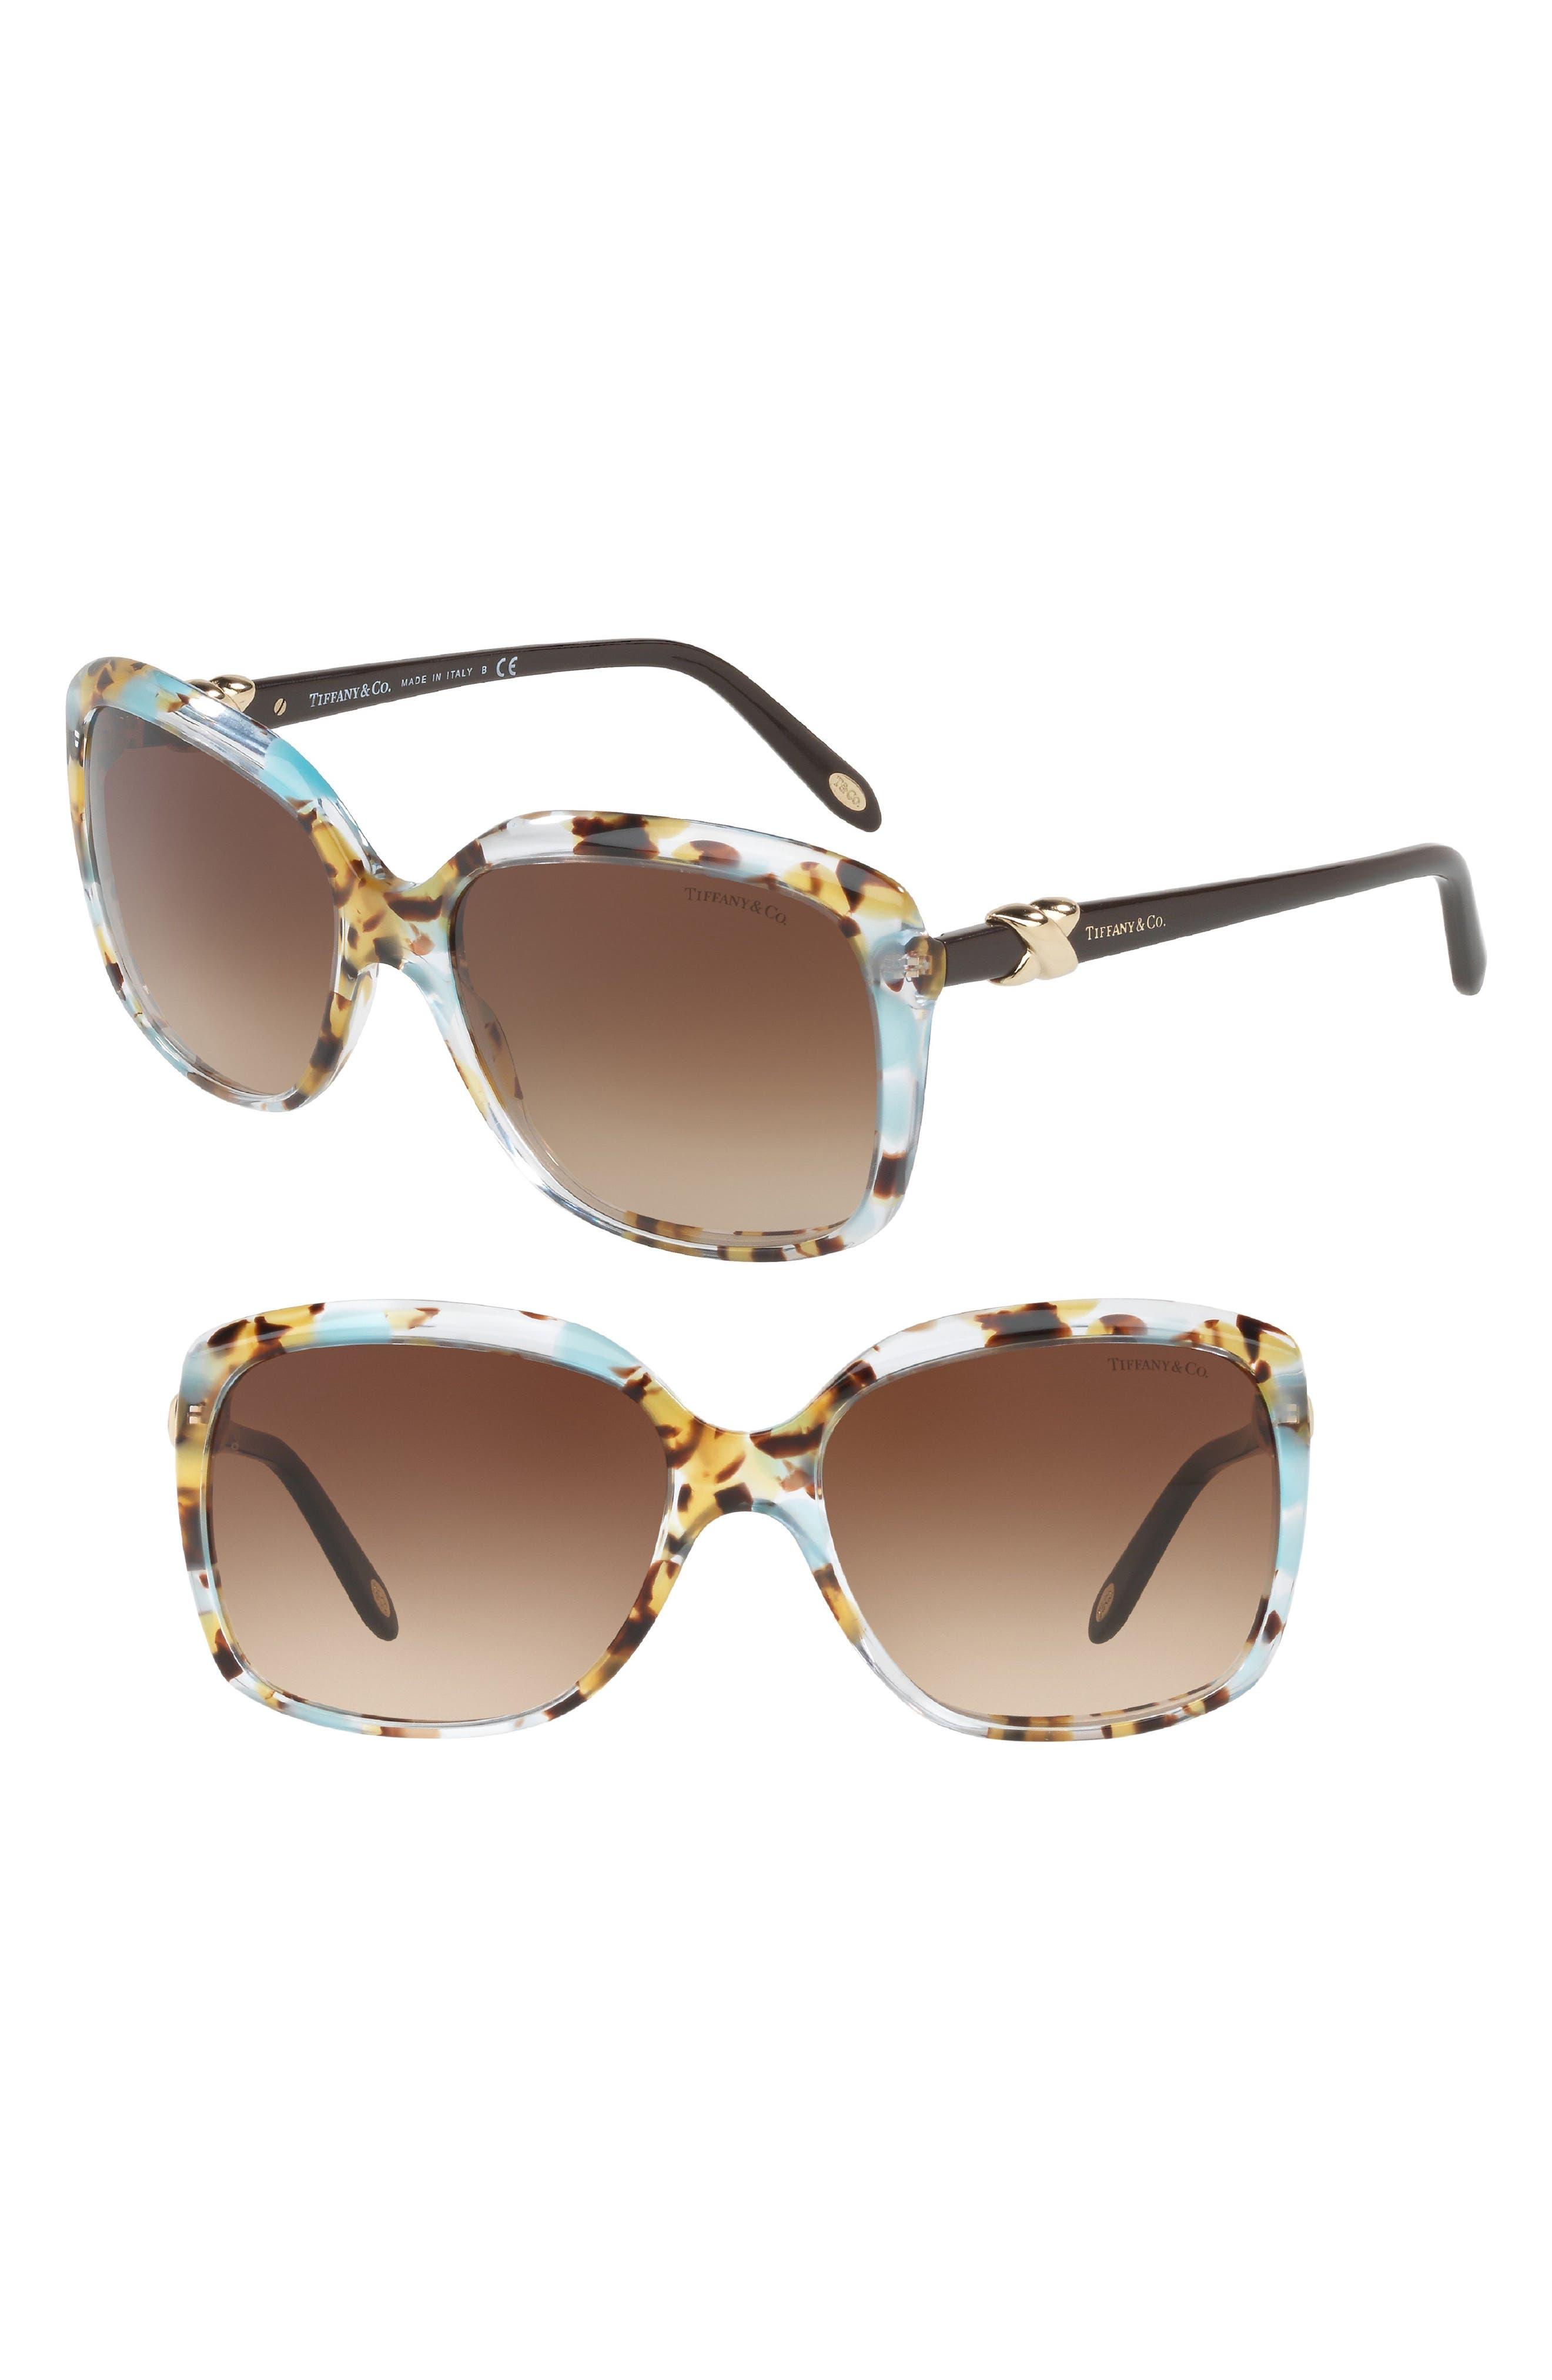 58mm Rectangular Sunglasses,                             Main thumbnail 1, color,                             Havana Blue Gradient